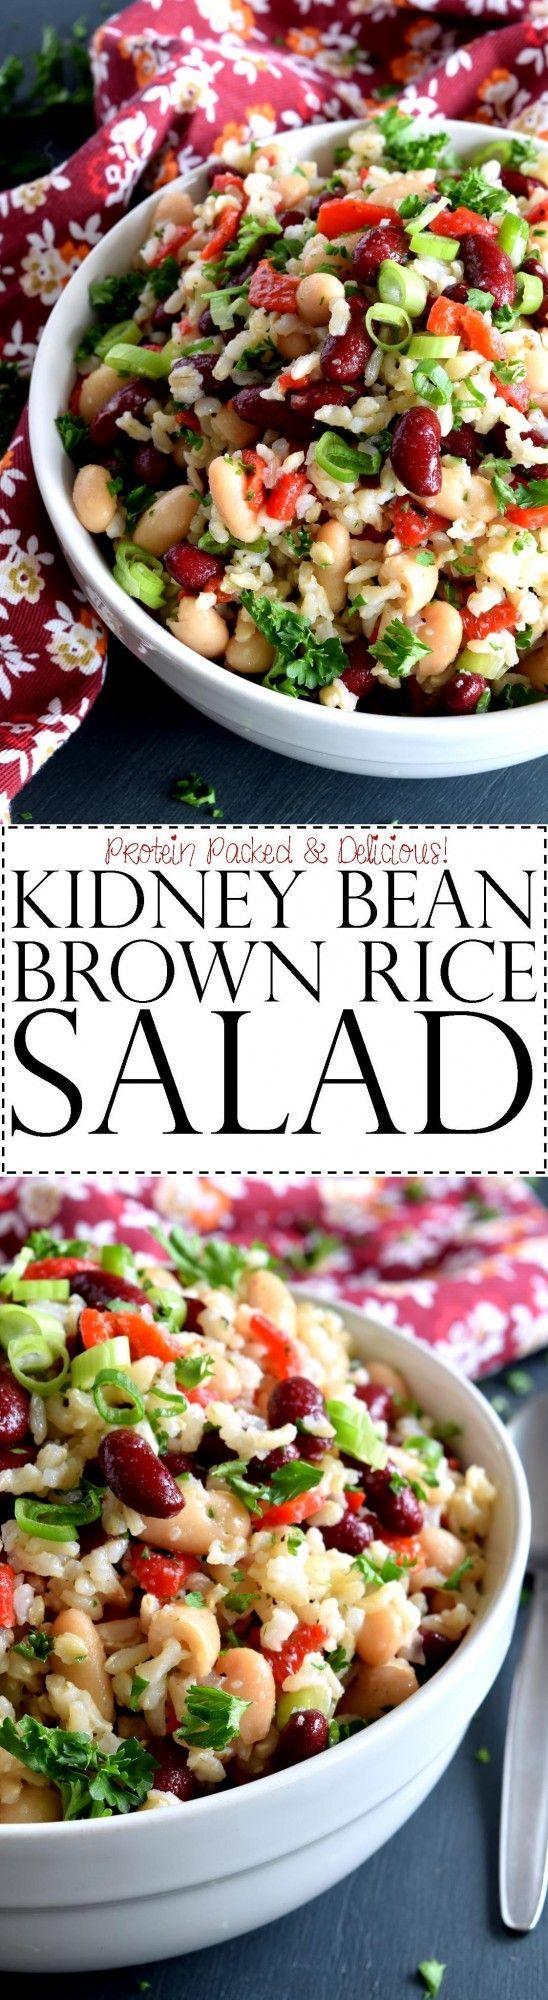 Kidney Bean Brown Rice Salad - A light, fresh taste with ...